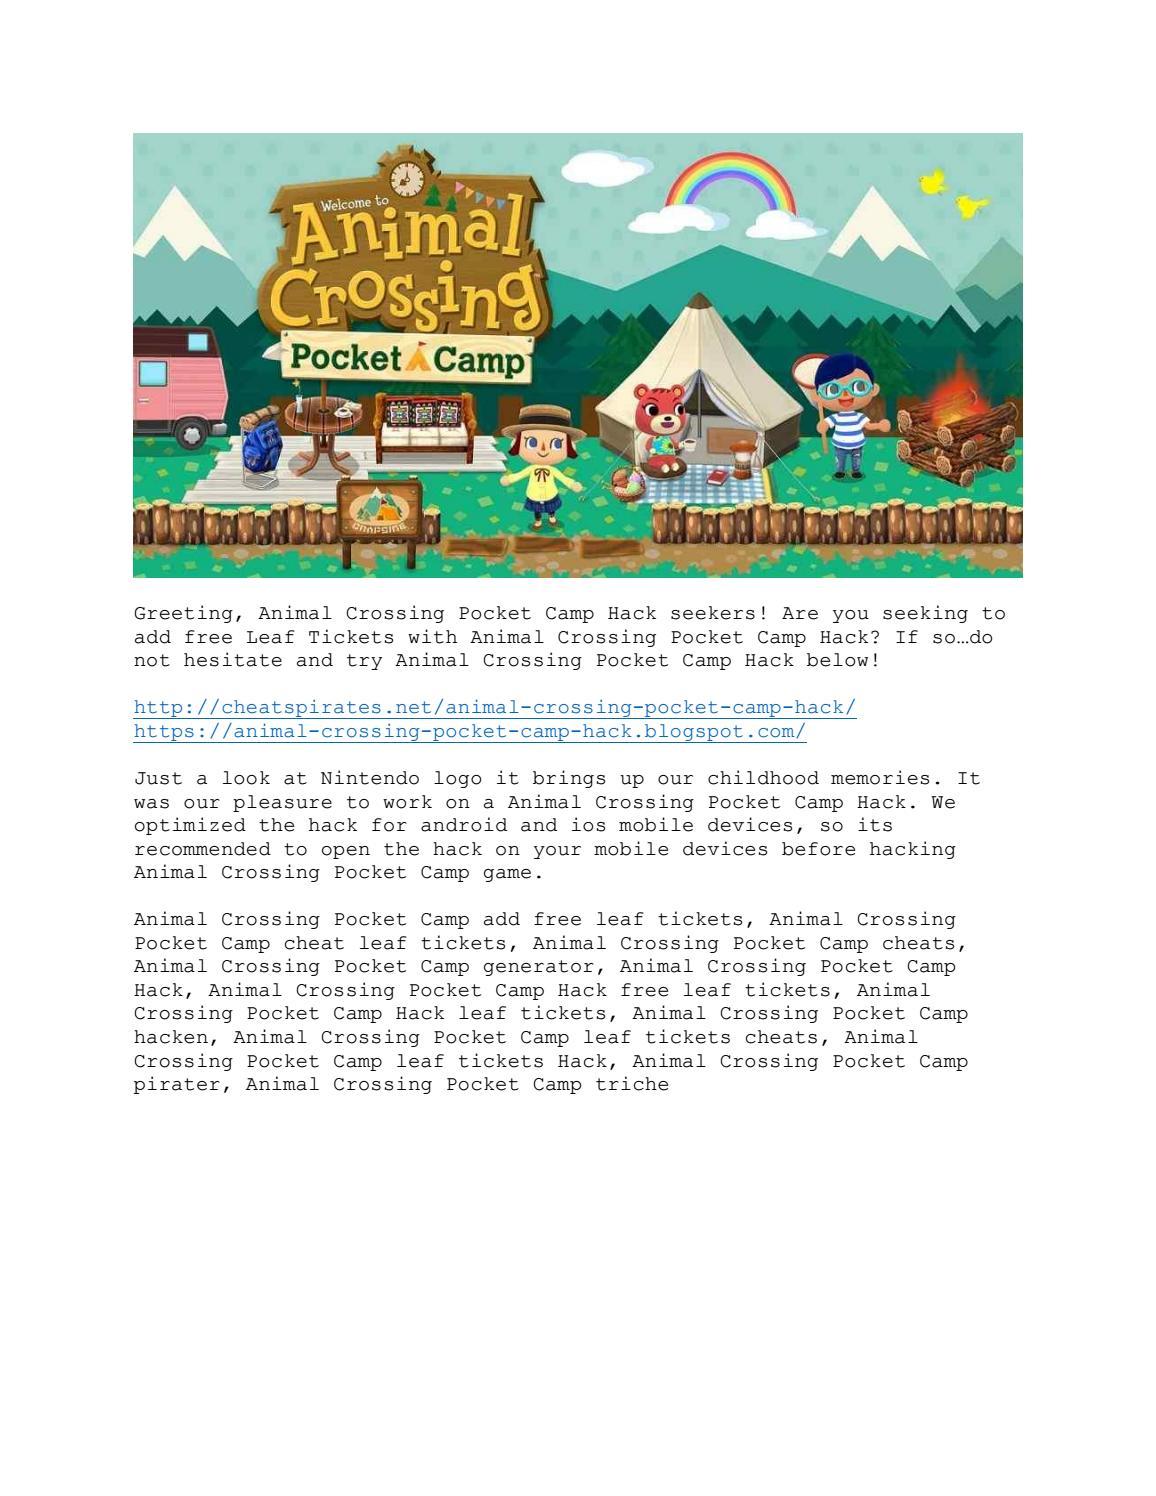 Animal Crossing Pocket Camp Hack Leaf Tickets By Animal Crossing